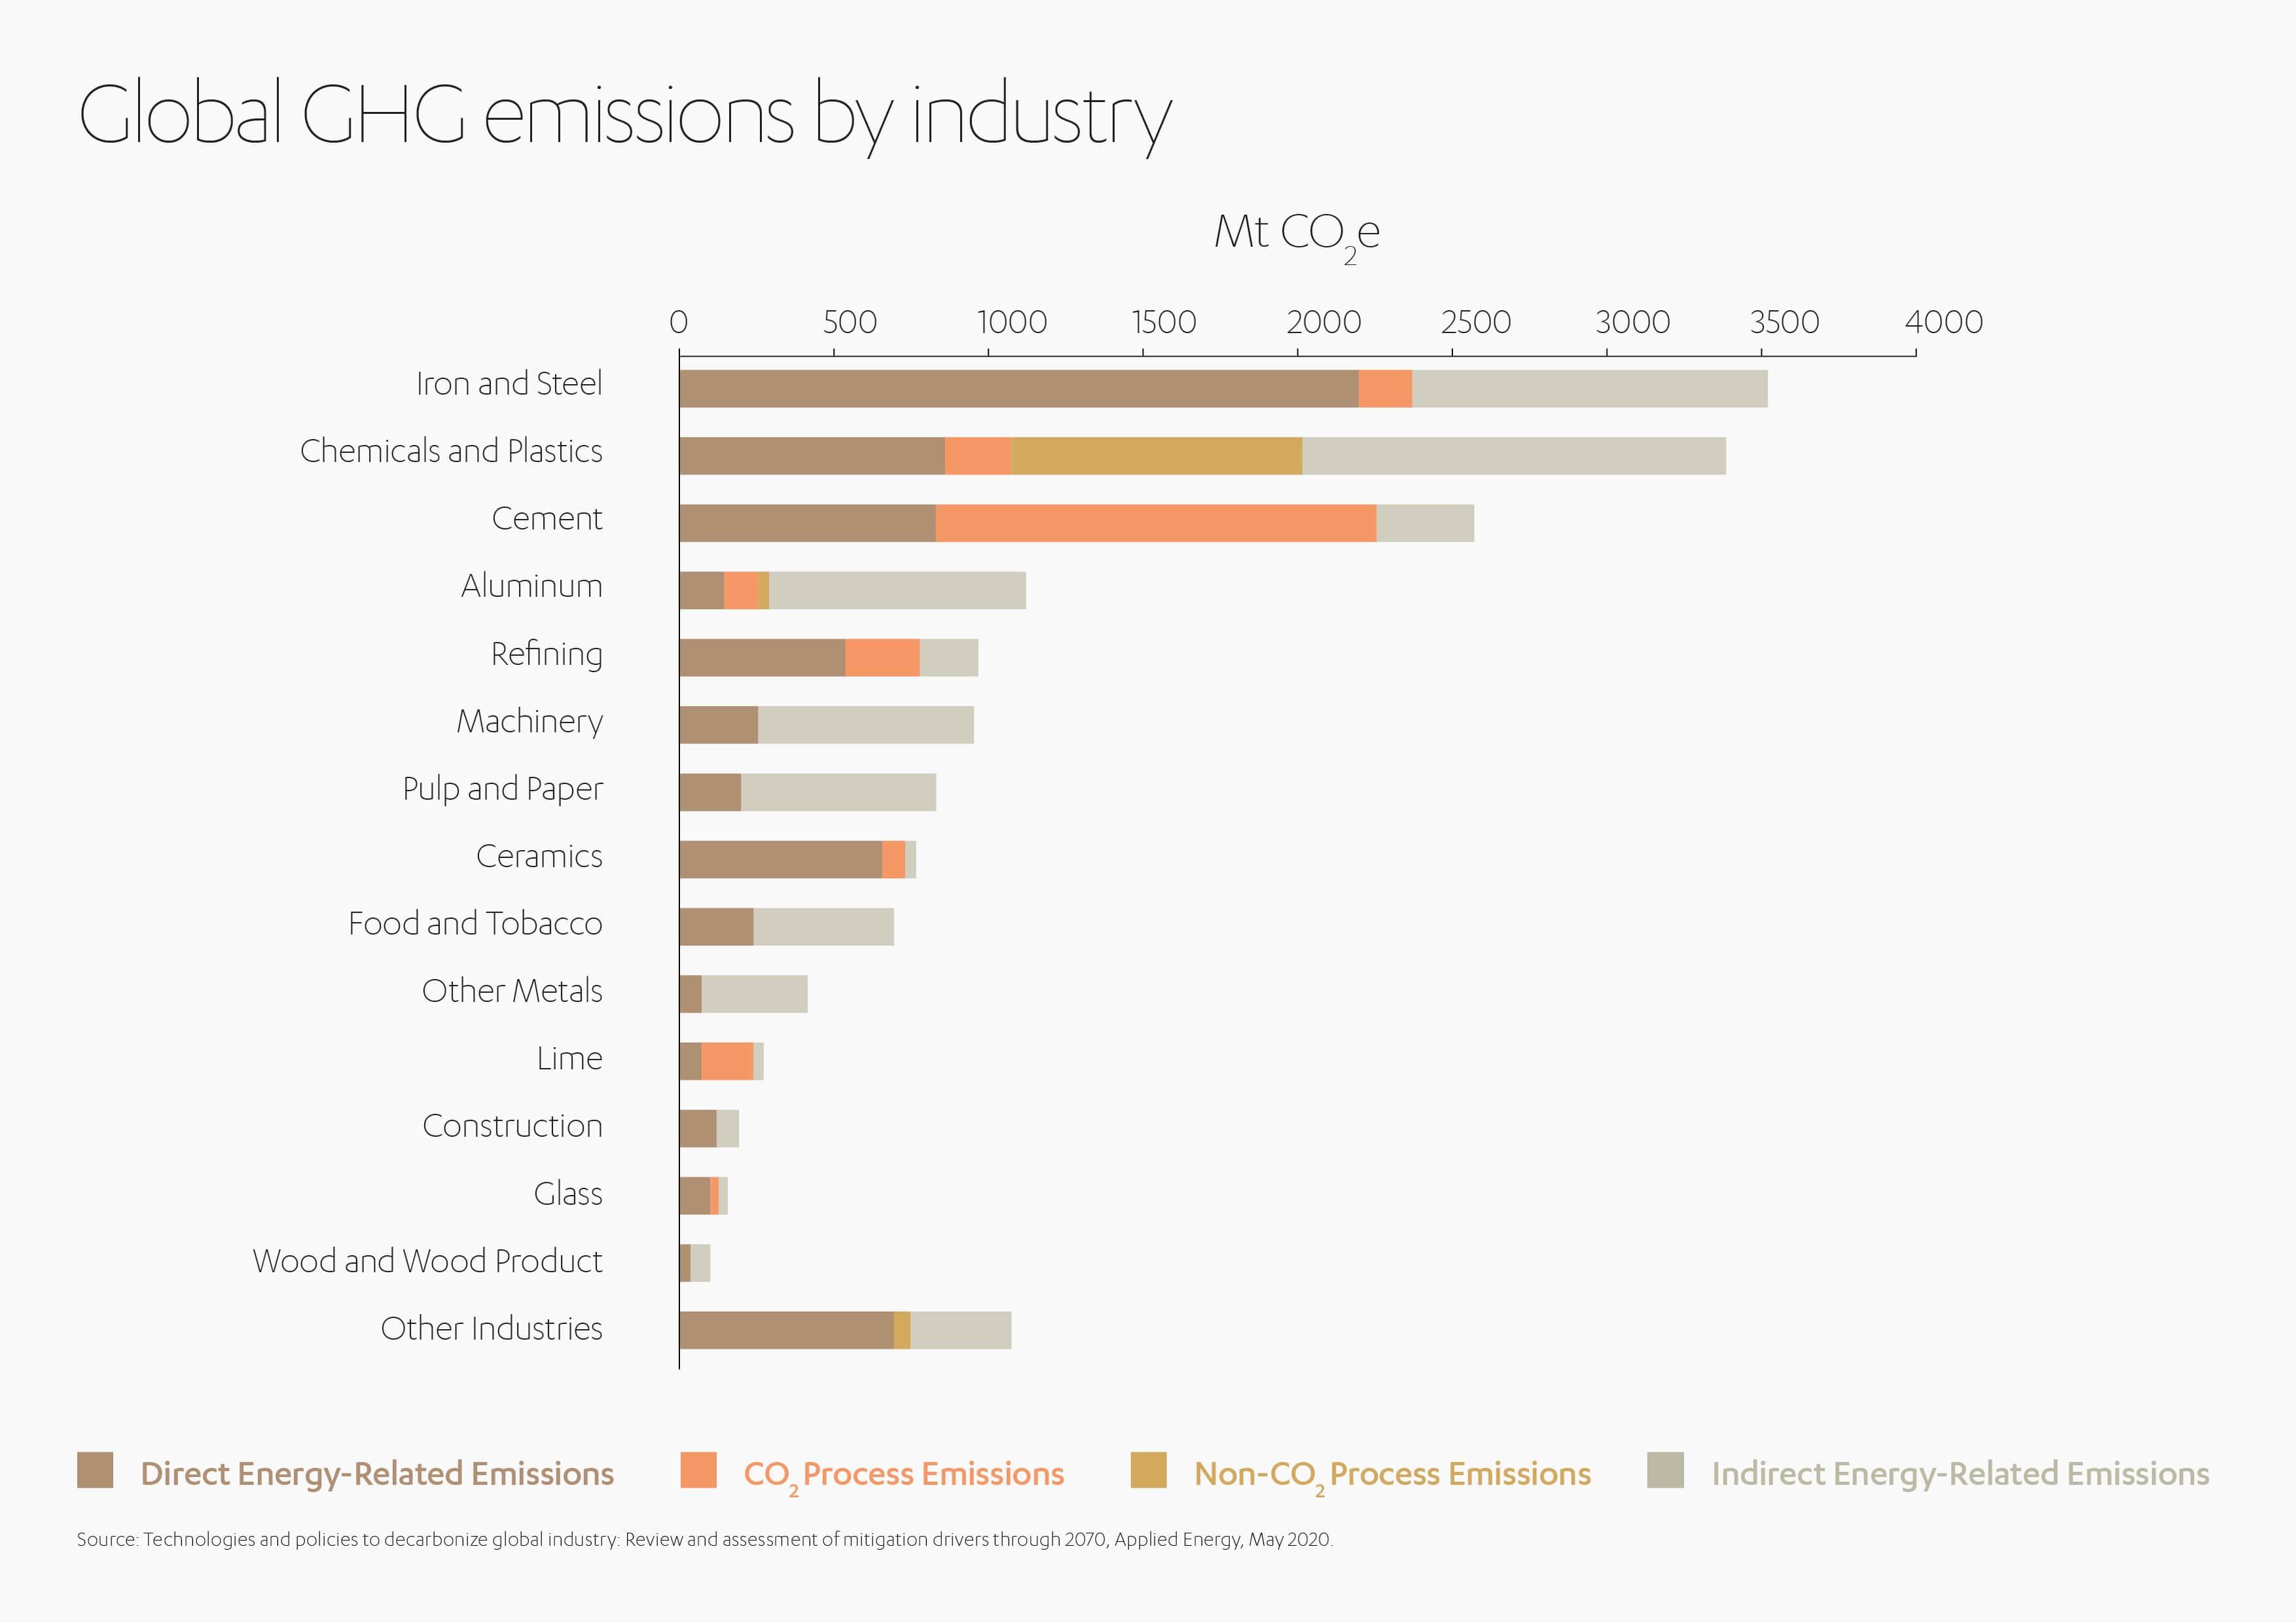 Global GHG Emissions